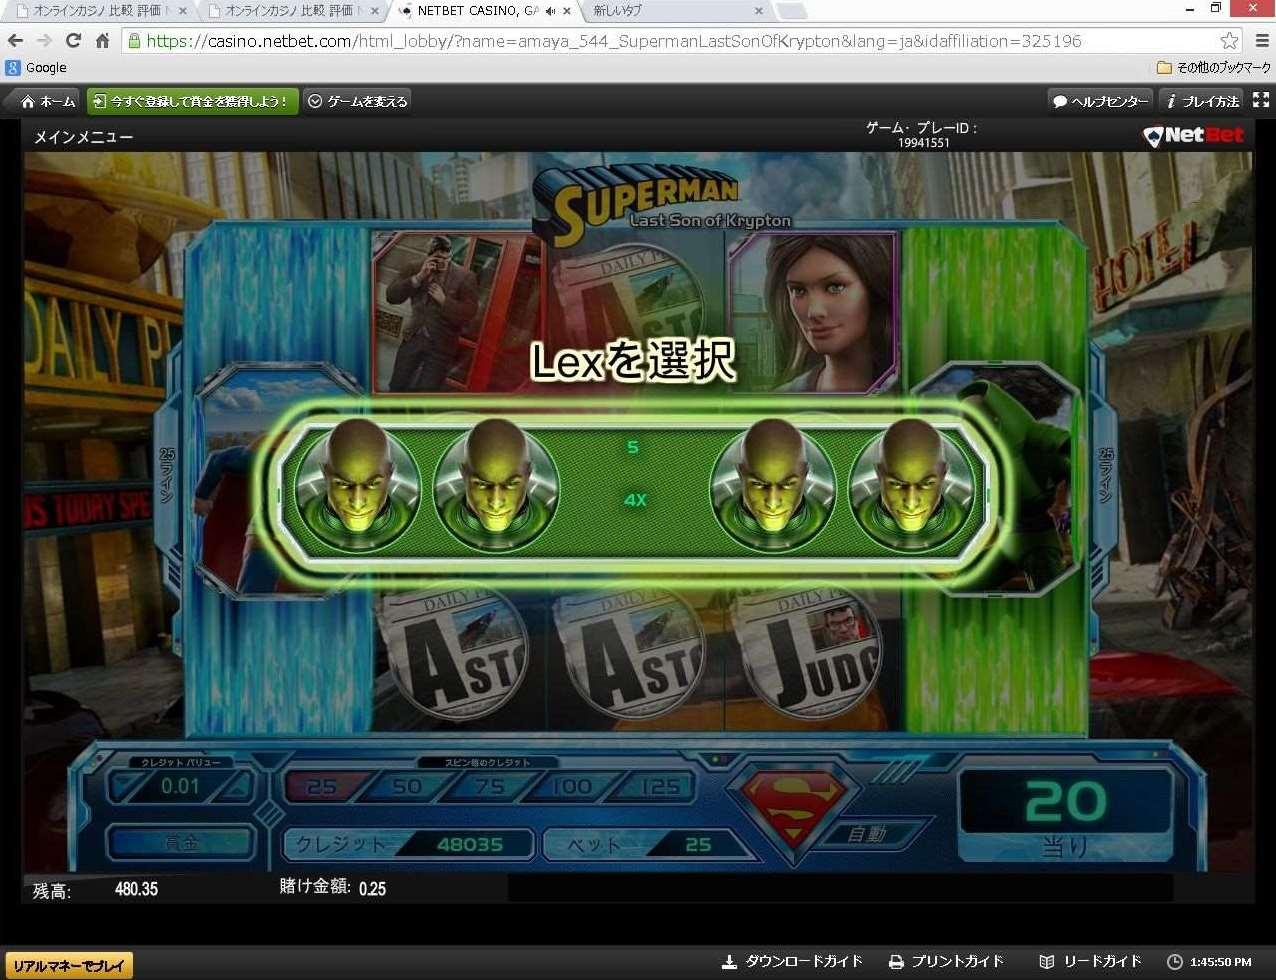 Lex Luther フローズンワイルドフリーゲーム4